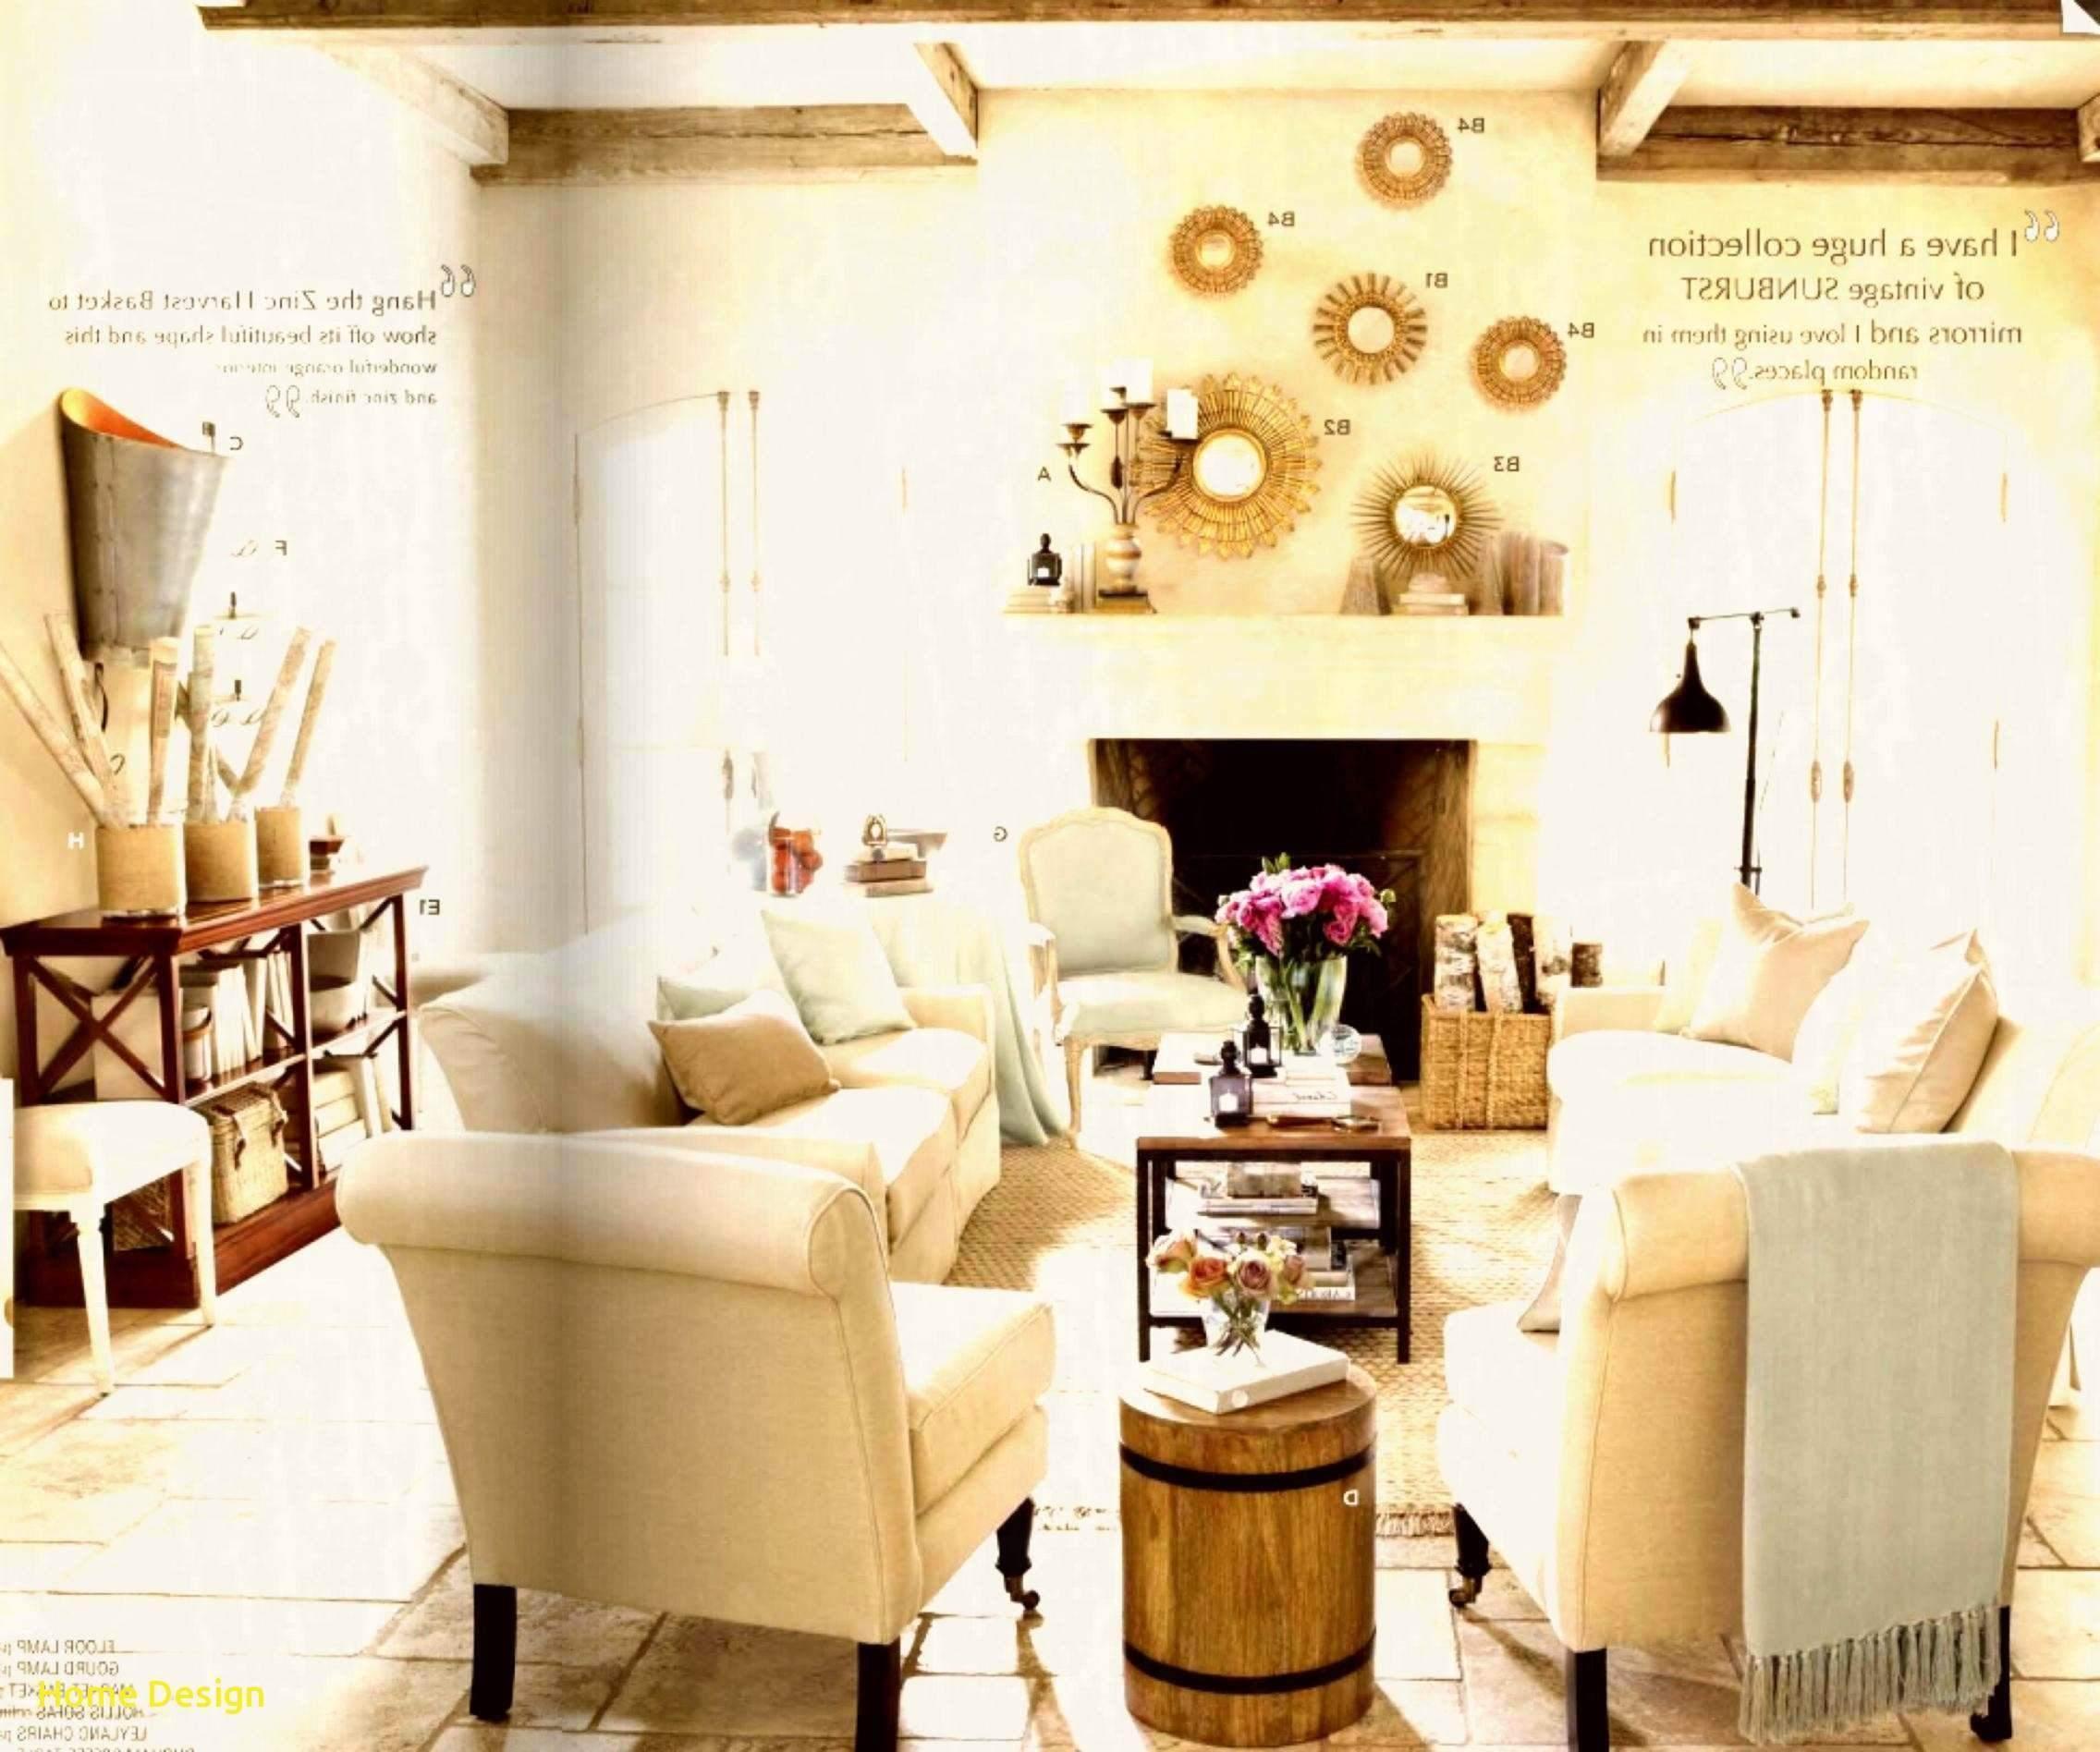 wohnzimmer industrial inspirierend industrial living room decor inspirational luxury wohnzimmer of wohnzimmer industrial